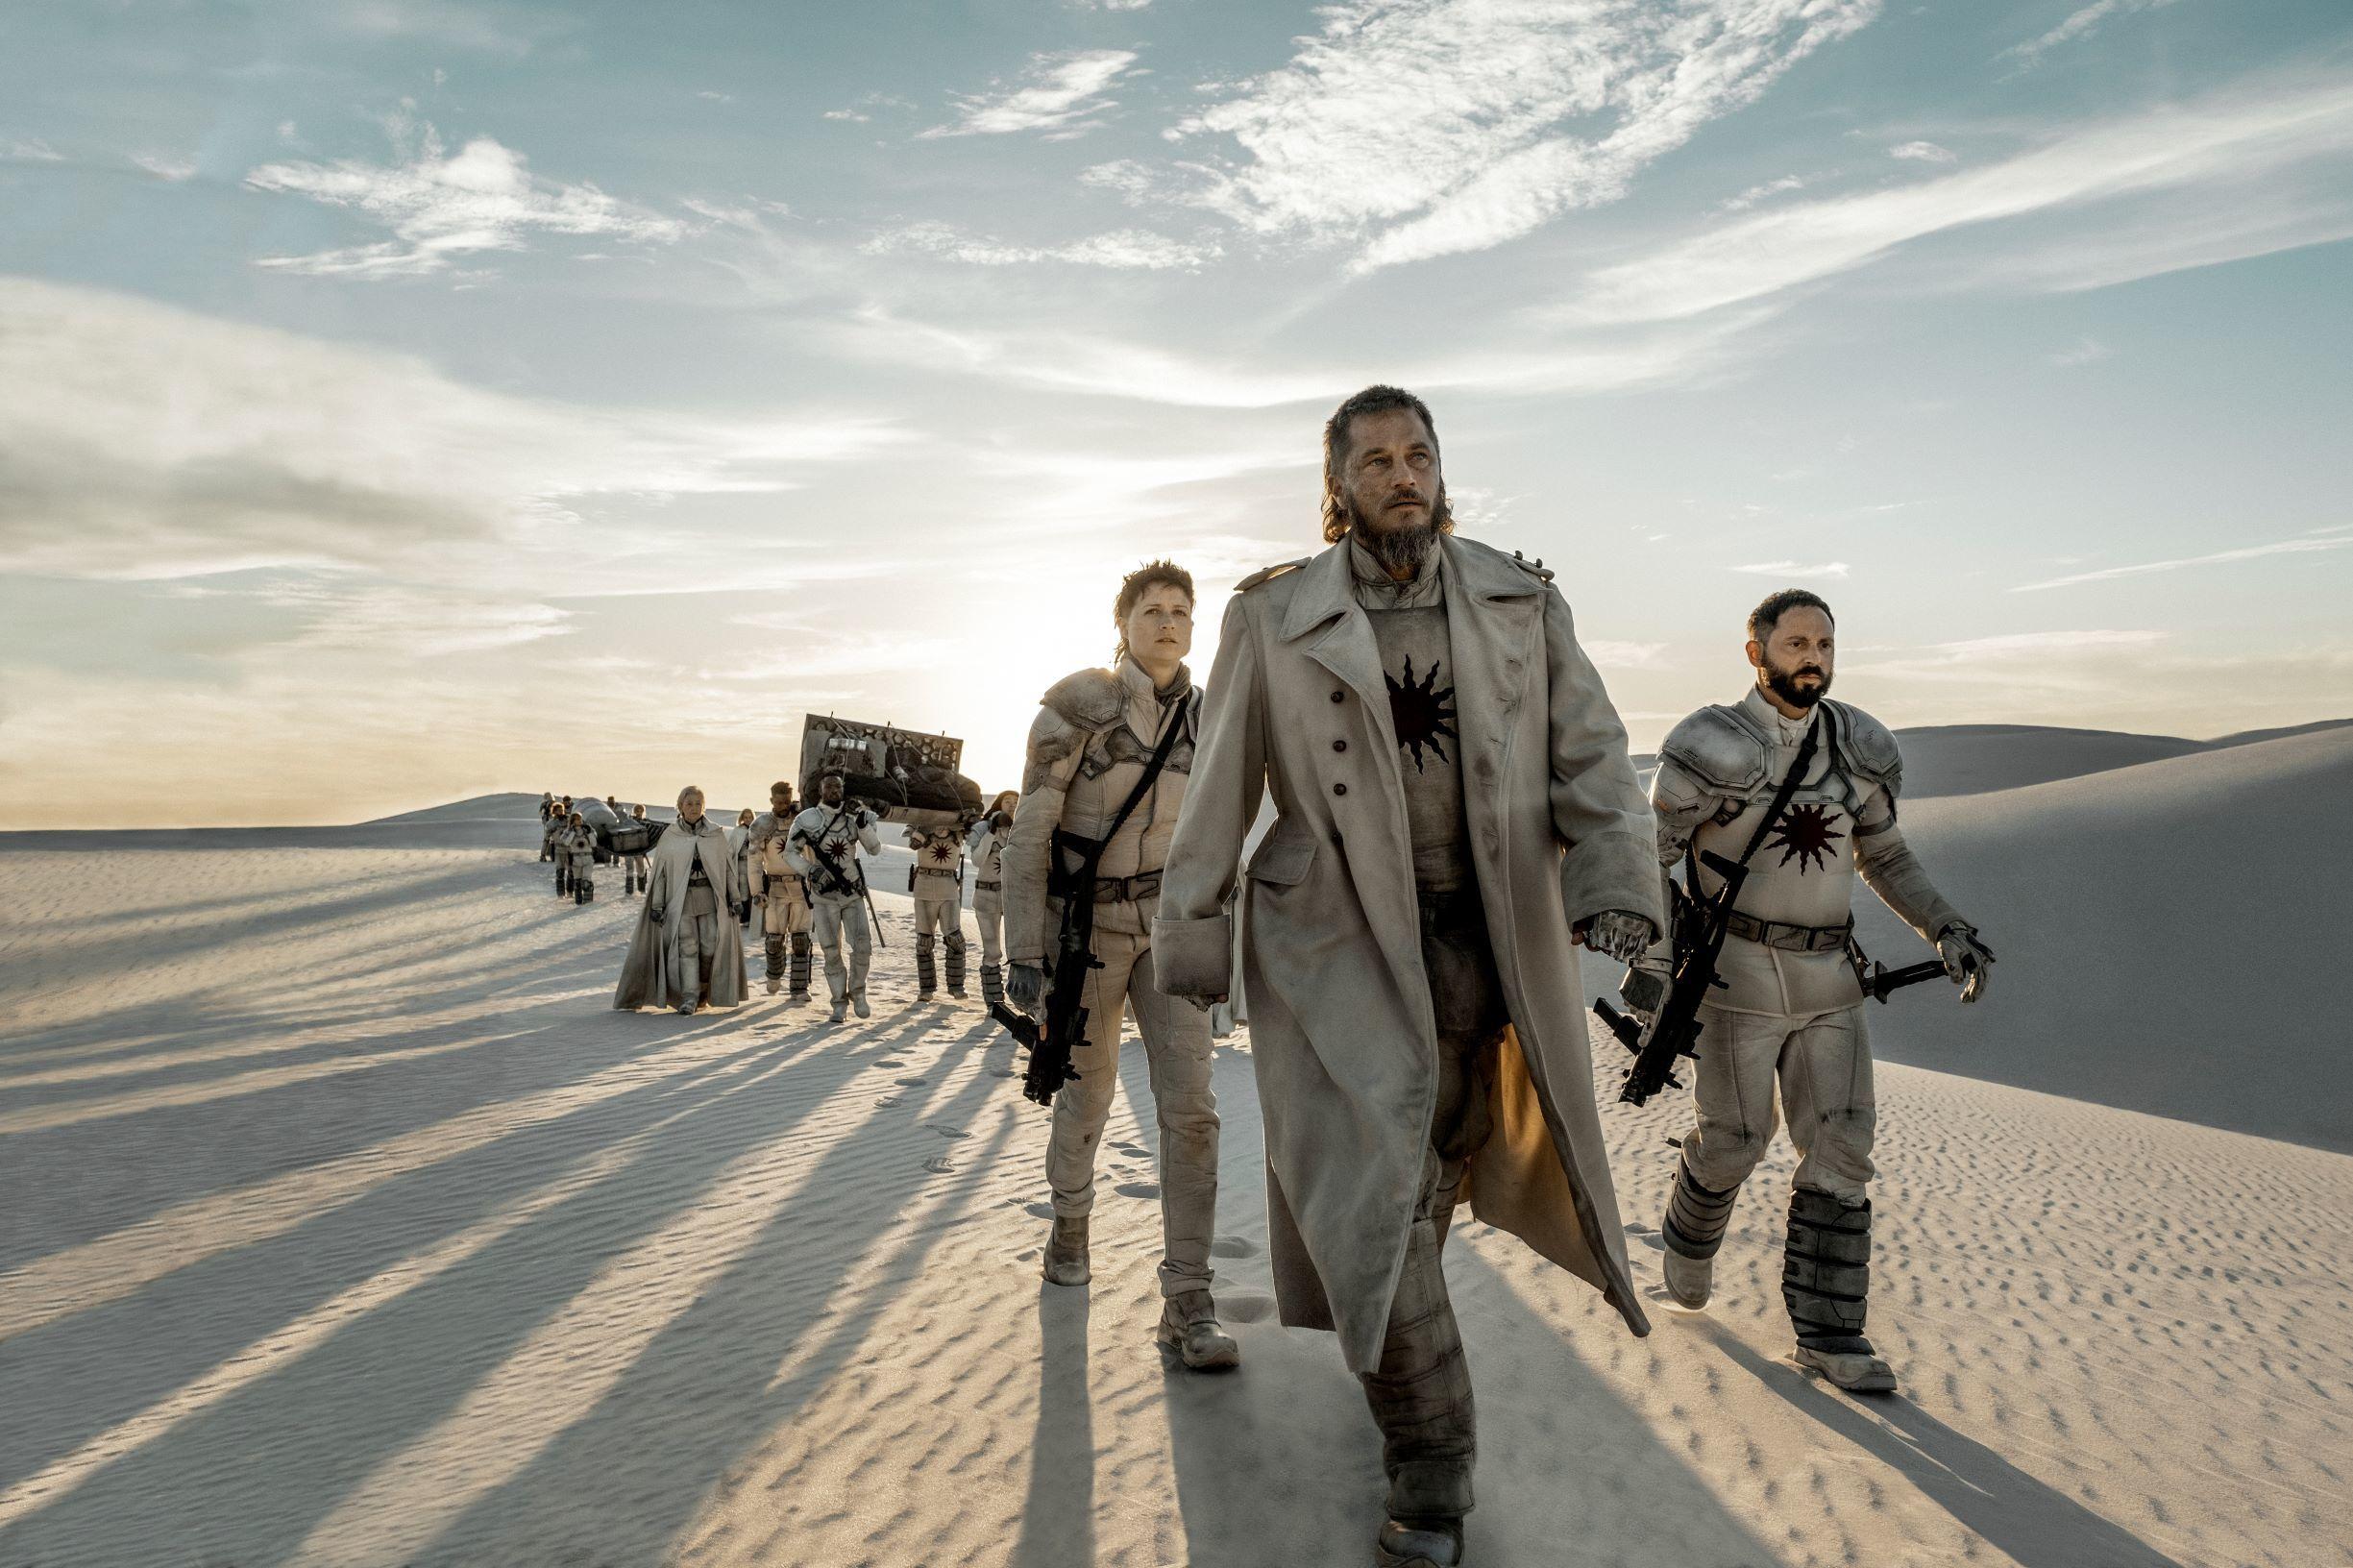 HBO Maxオリジナルシリーズ『レイズド・バイ・ウルブス / 神なき惑星』